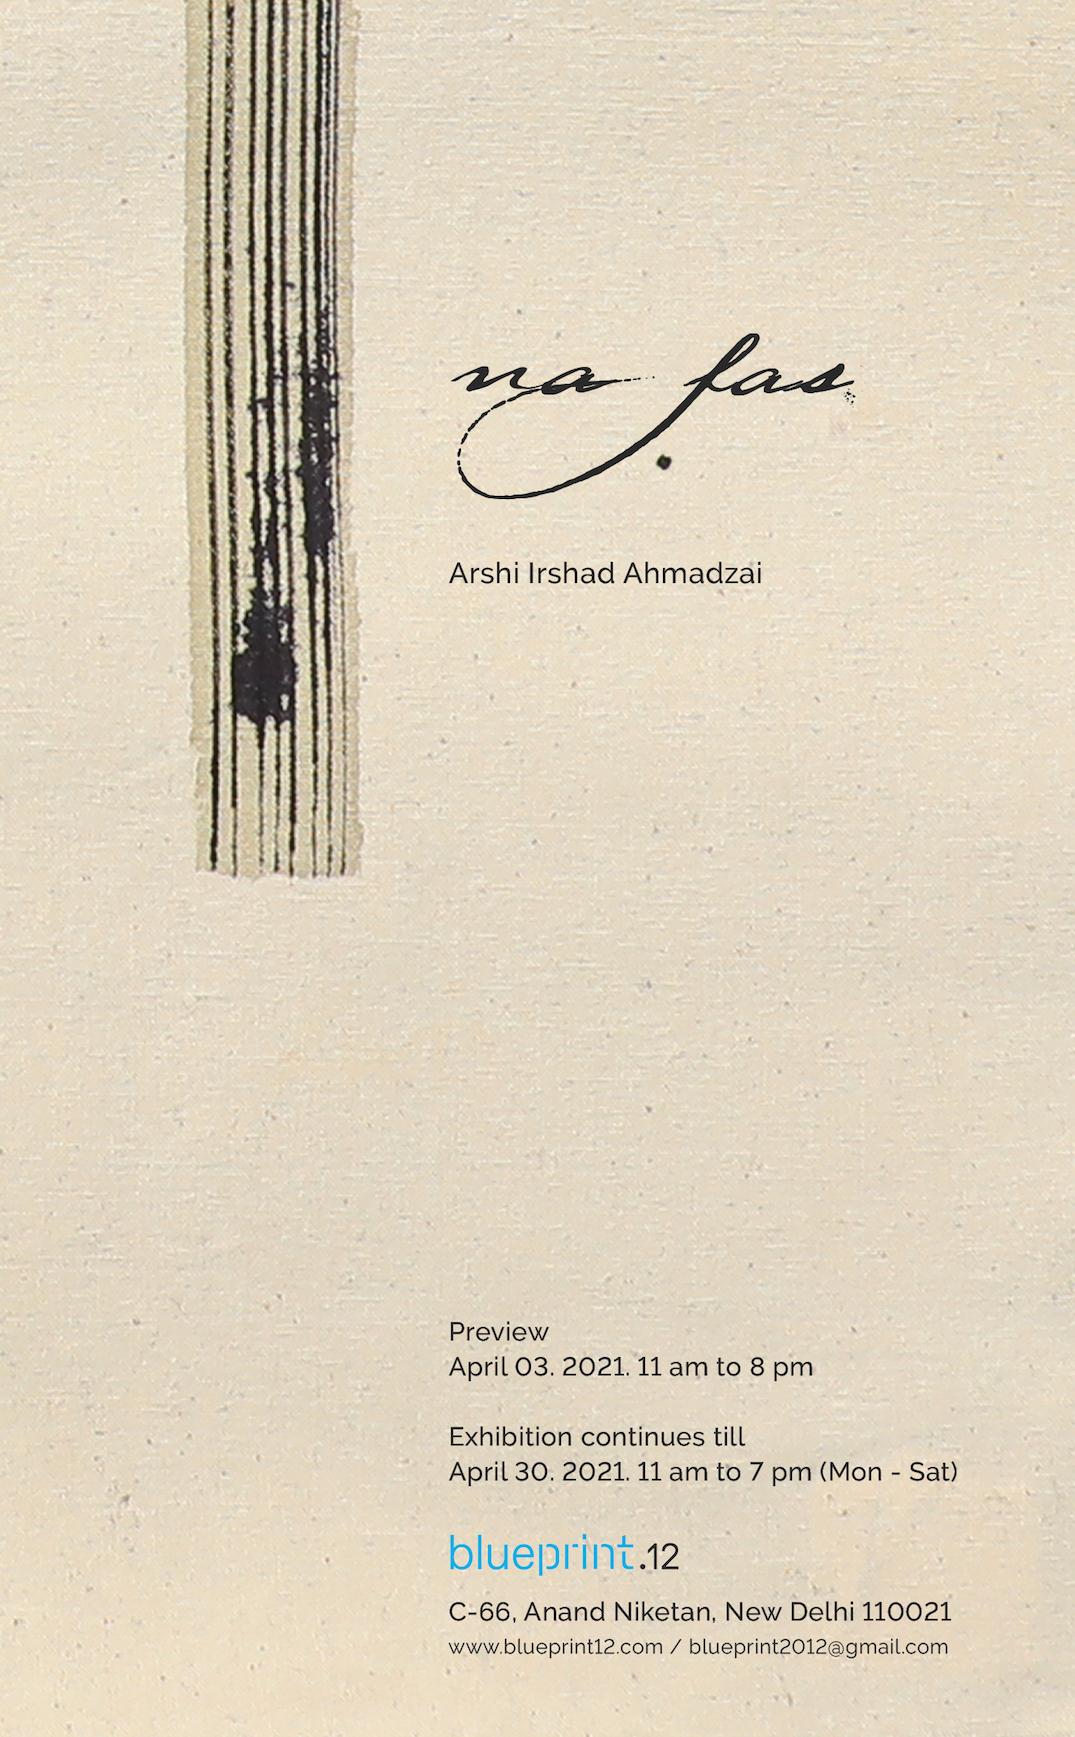 Arshi Irshad Ahmadzai, natural colour on cloth, south asian